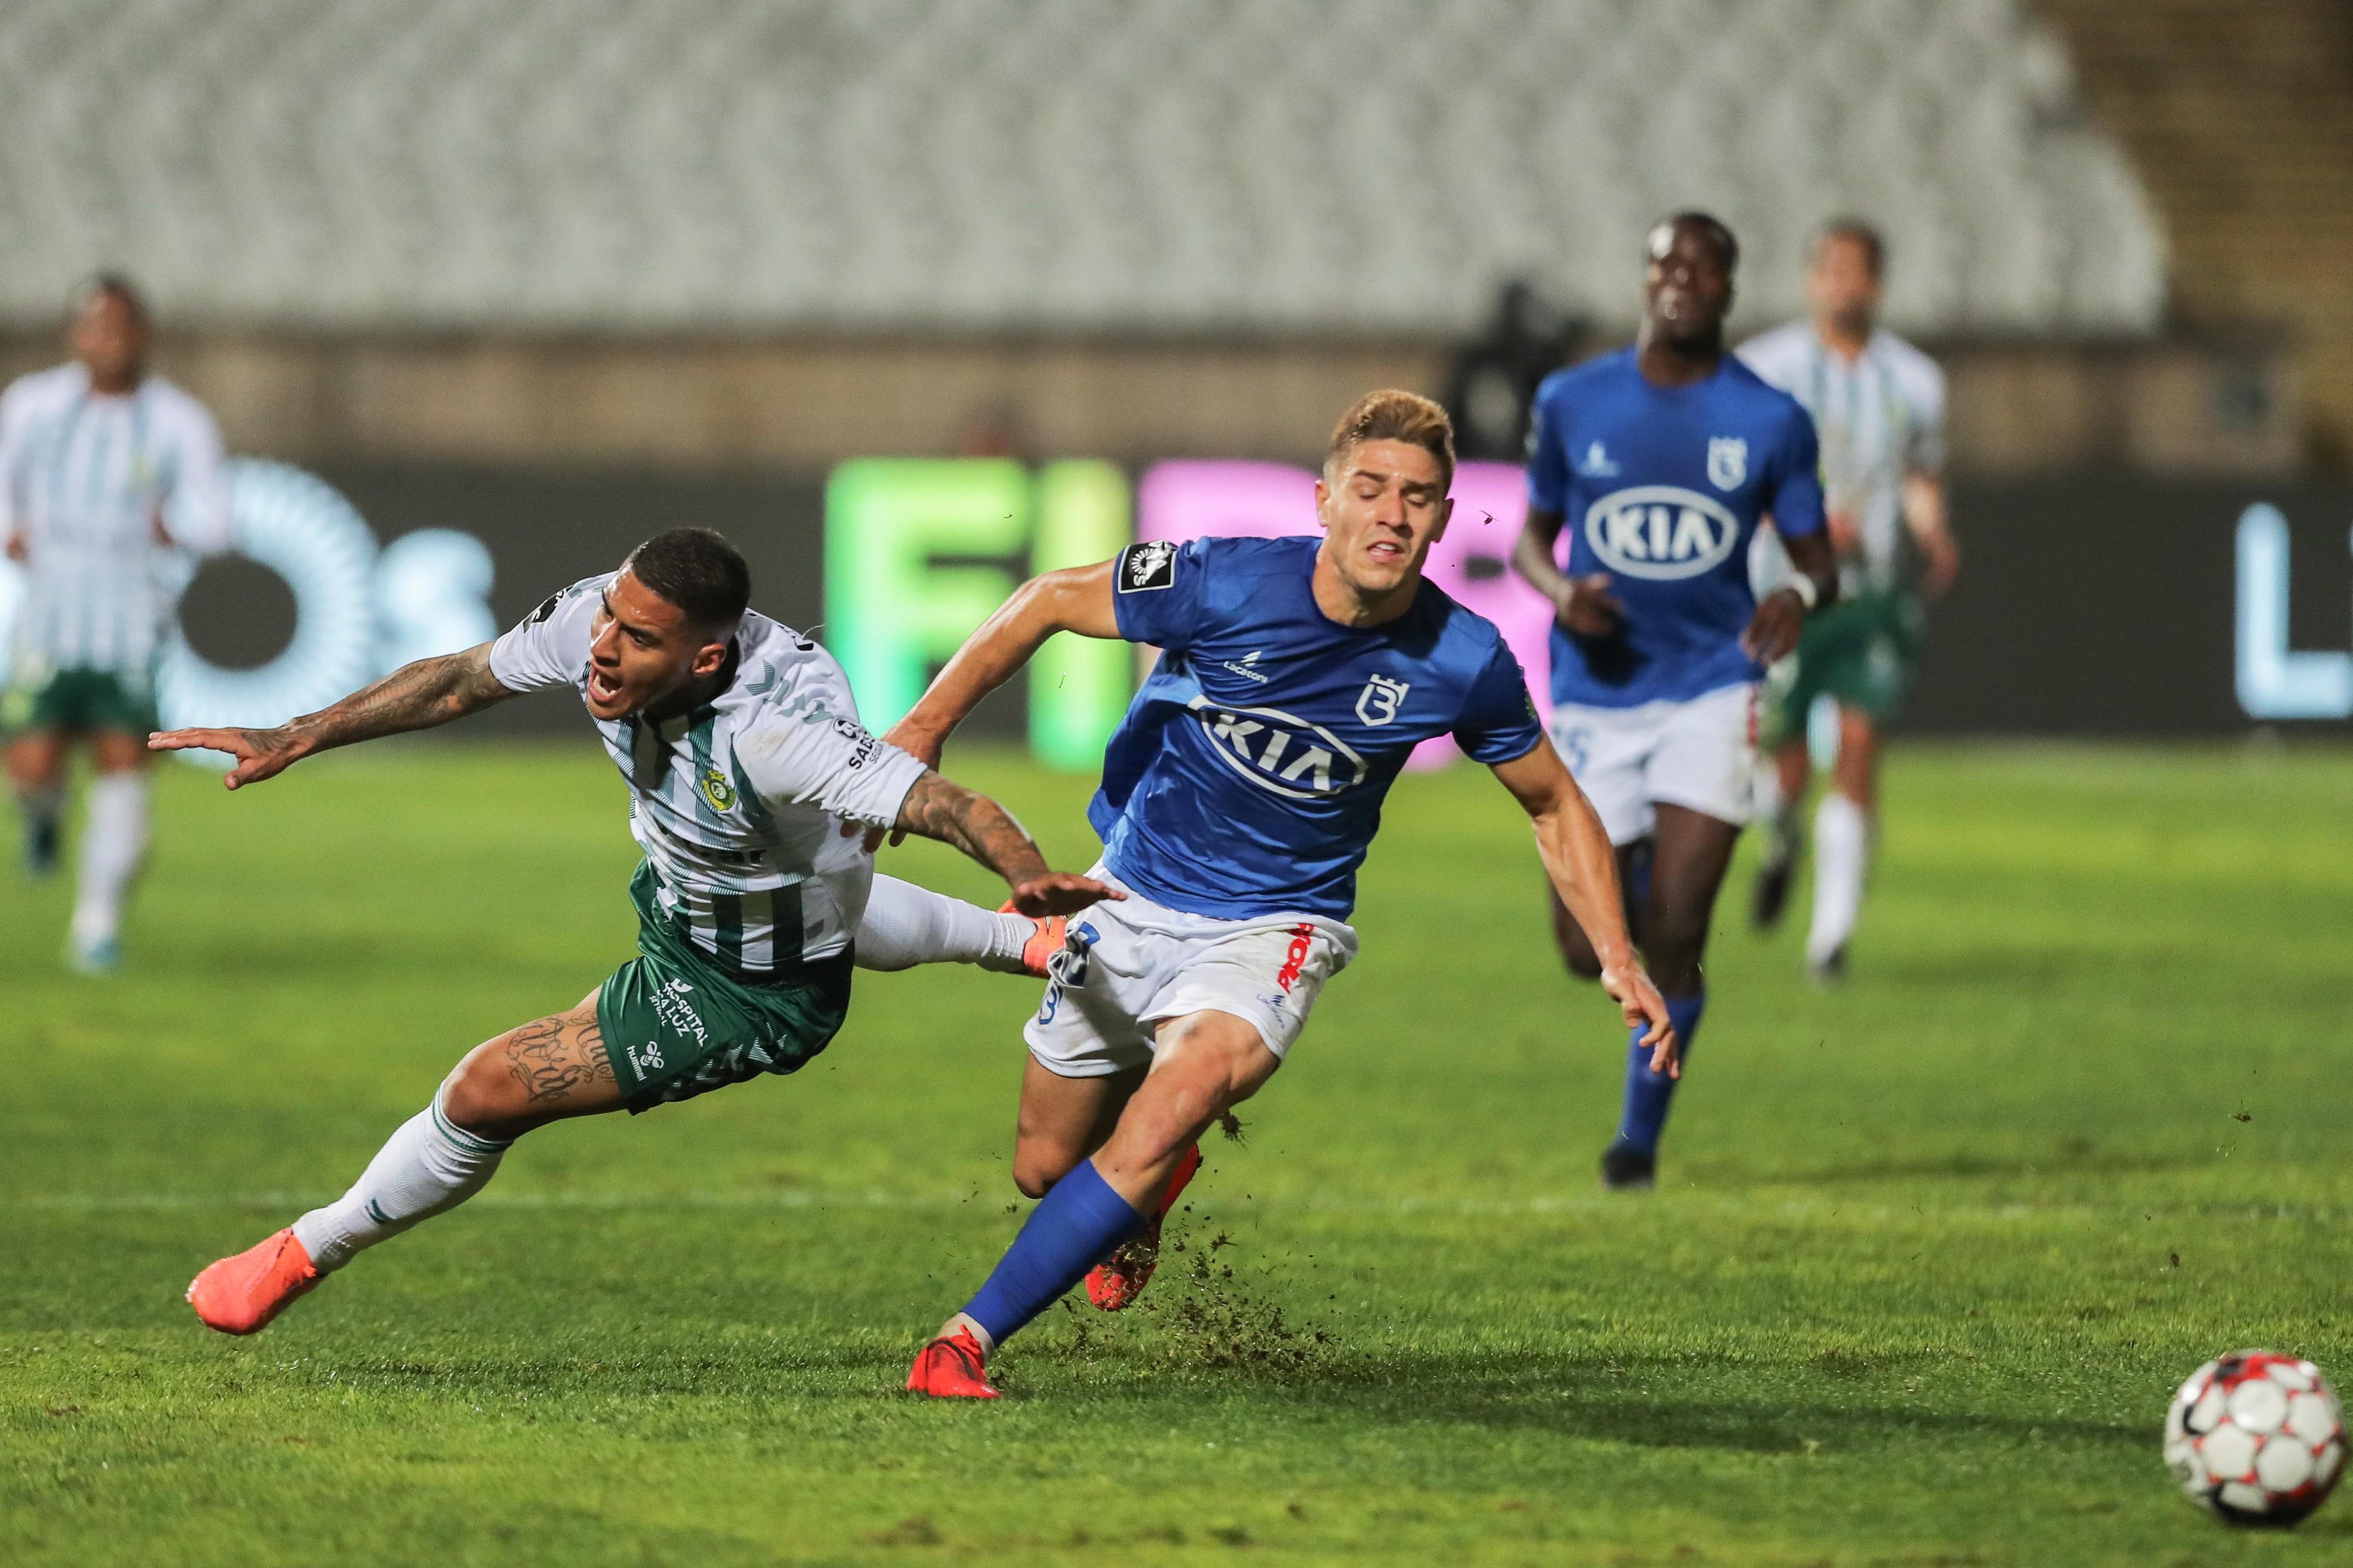 Vitória de Setúbal vence Belenenses com golo de Guedes